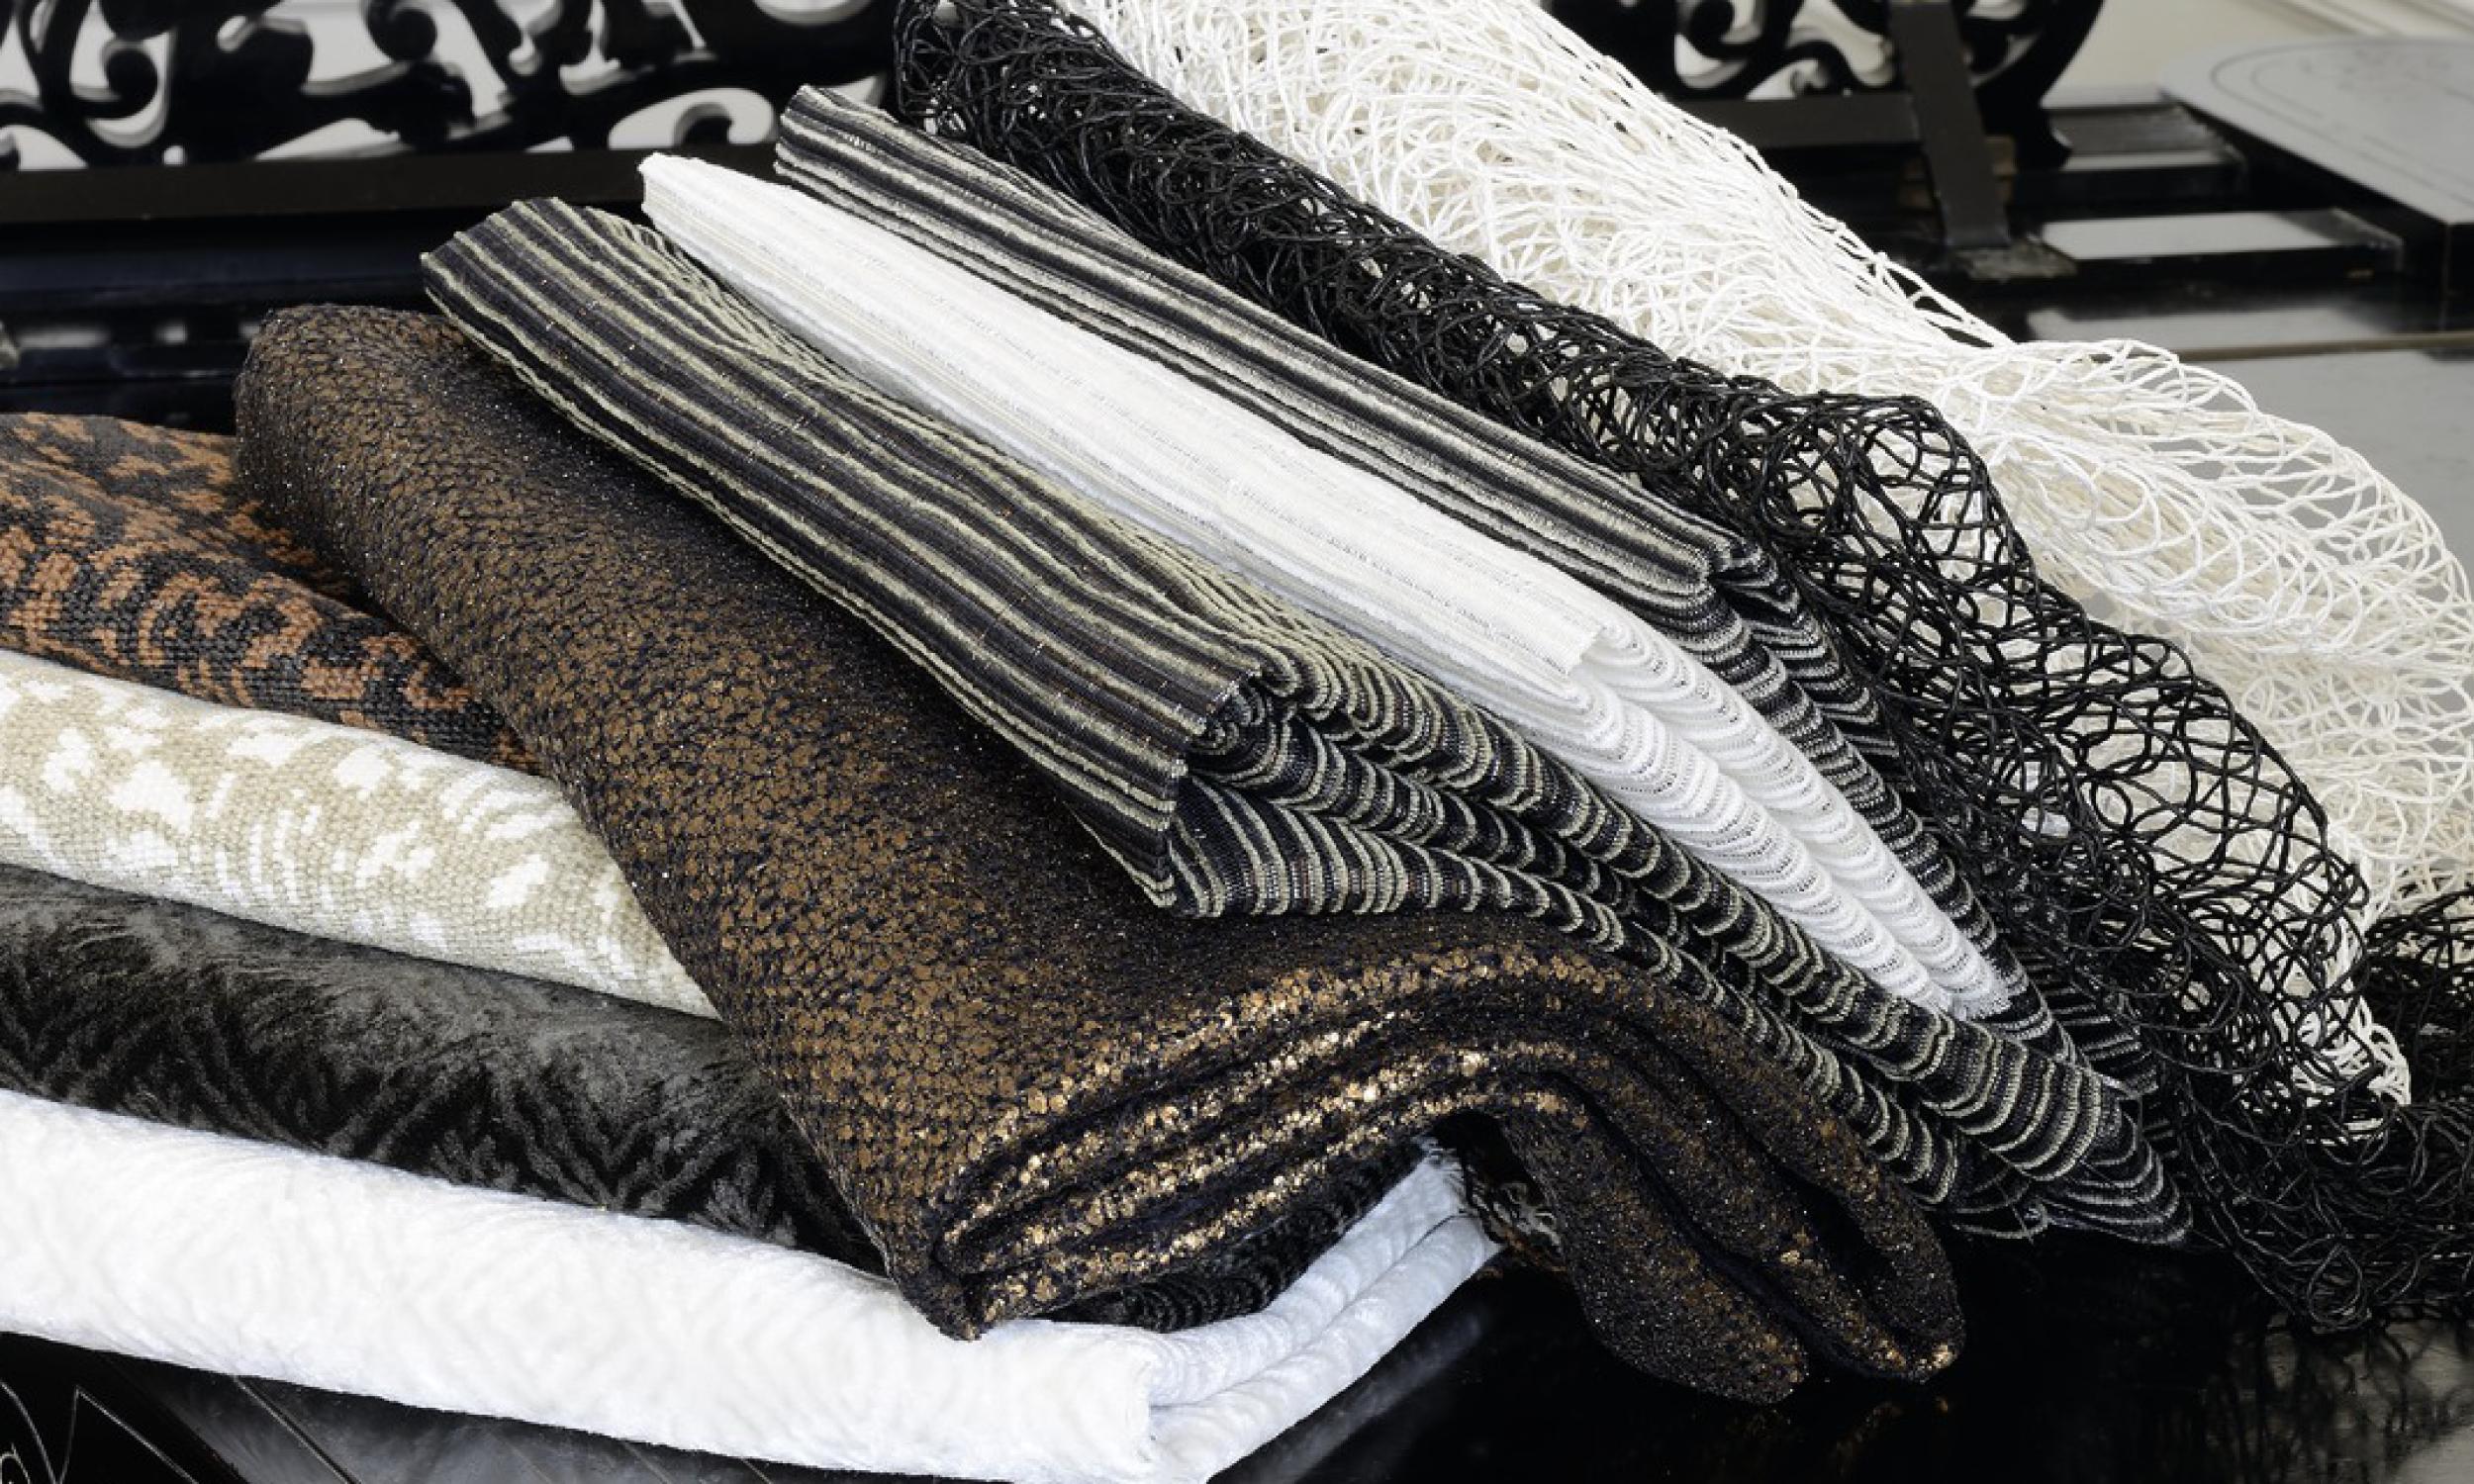 tissus ameublement nantes best best tissus myrtille site officiel tissus myrtille nantes rennes. Black Bedroom Furniture Sets. Home Design Ideas